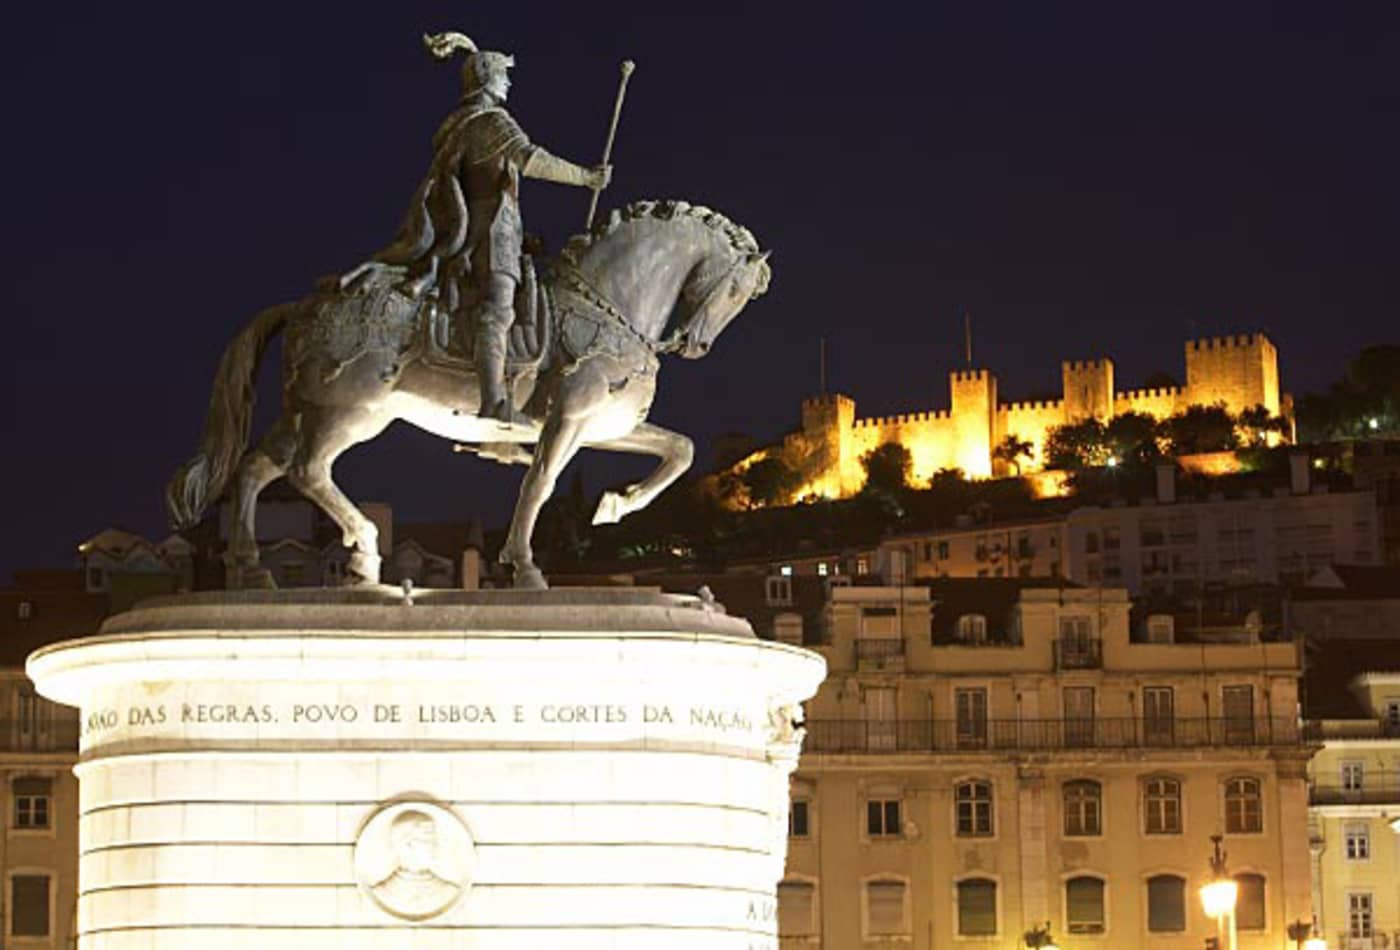 CNBC_Major_Events_Eurozone_Portugal.jpg